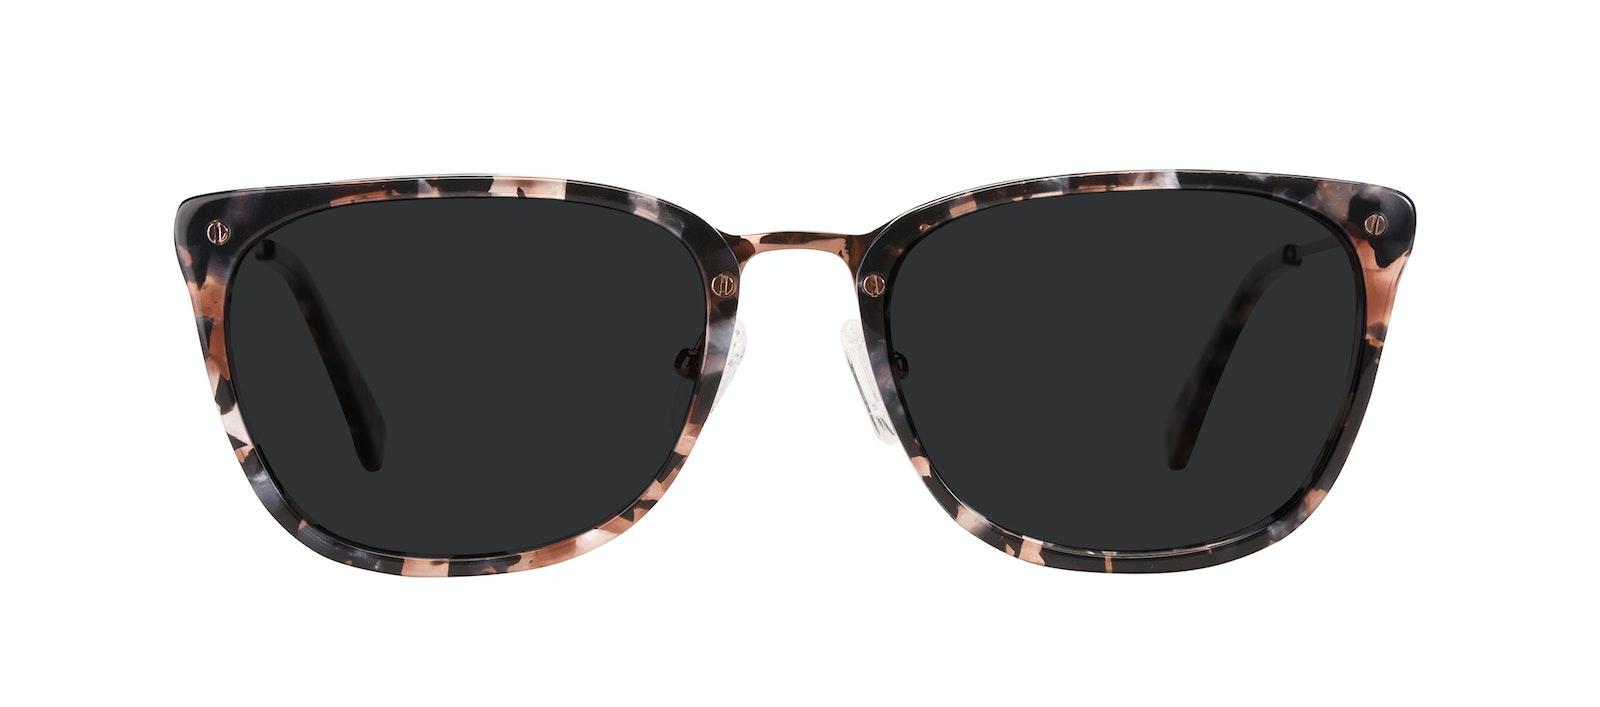 Affordable Fashion Glasses Rectangle Sunglasses Women Wonder Pink Flake Front